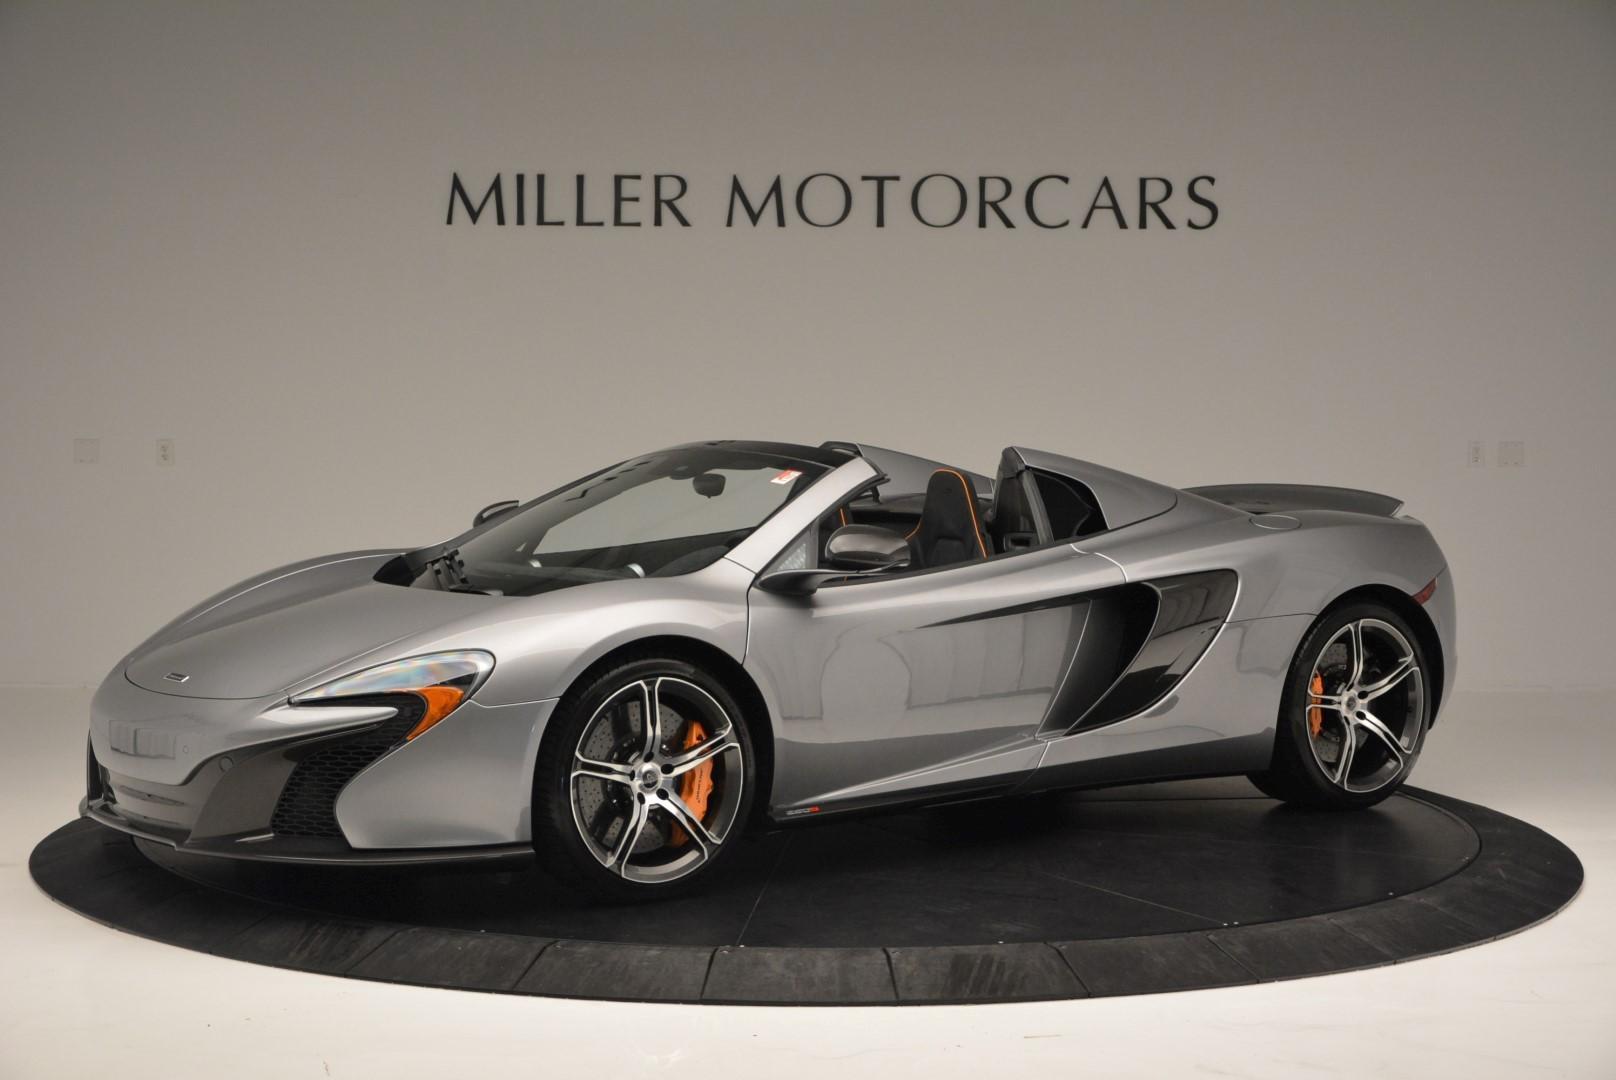 Used 2016 McLaren 650S SPIDER Convertible for sale Sold at Maserati of Westport in Westport CT 06880 1